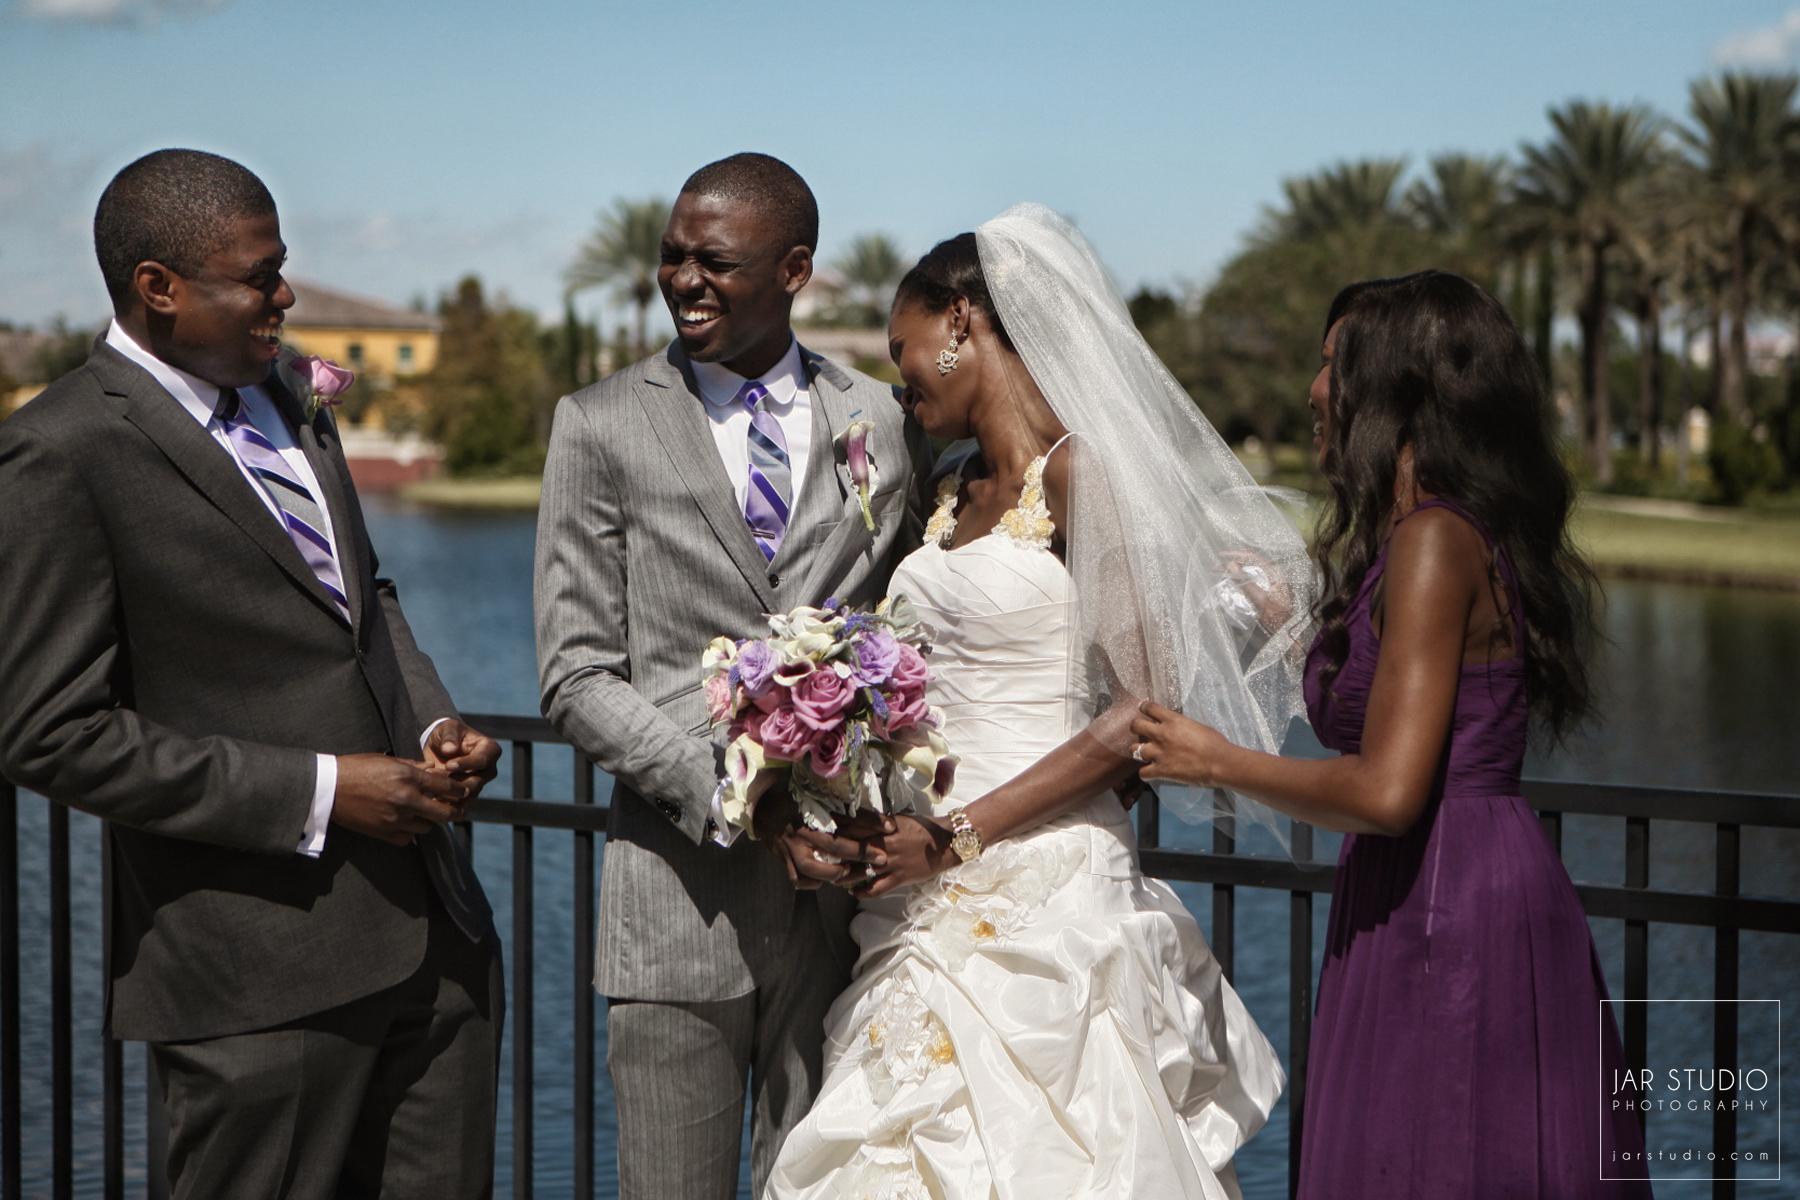 24-fun-destination-nigerian-wedding-central-florida-photographer-jarstudio.JPG